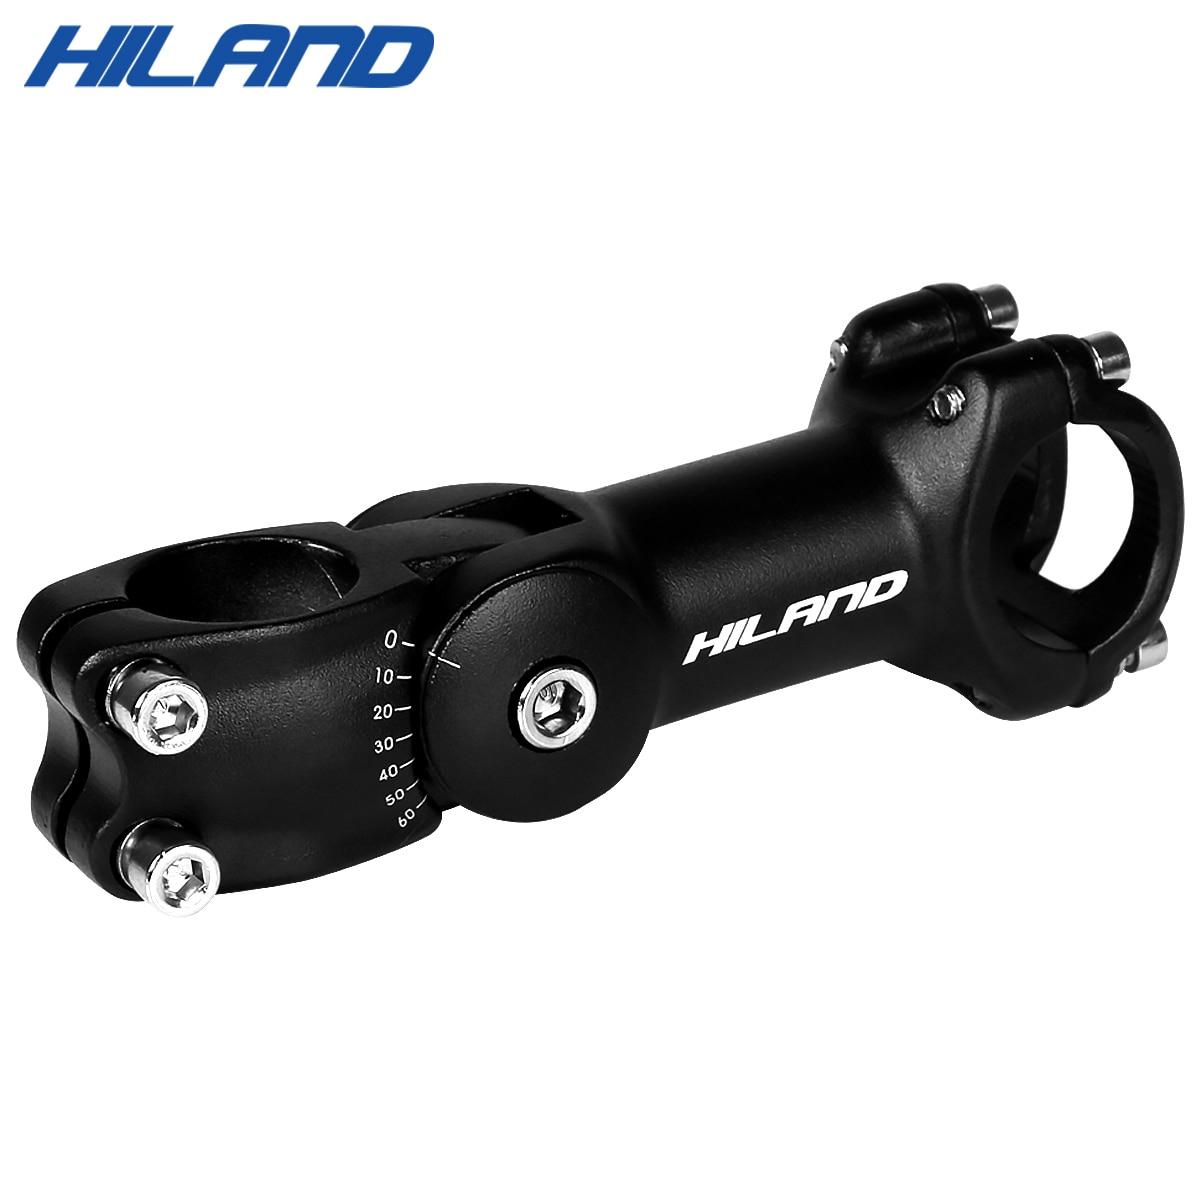 90 110mm High-Strength Lightweight 31.8mm&25.4mm Adjustable Bicycle Bike Stem Riser XC AM MTB Mountain Road Bike Bicycle